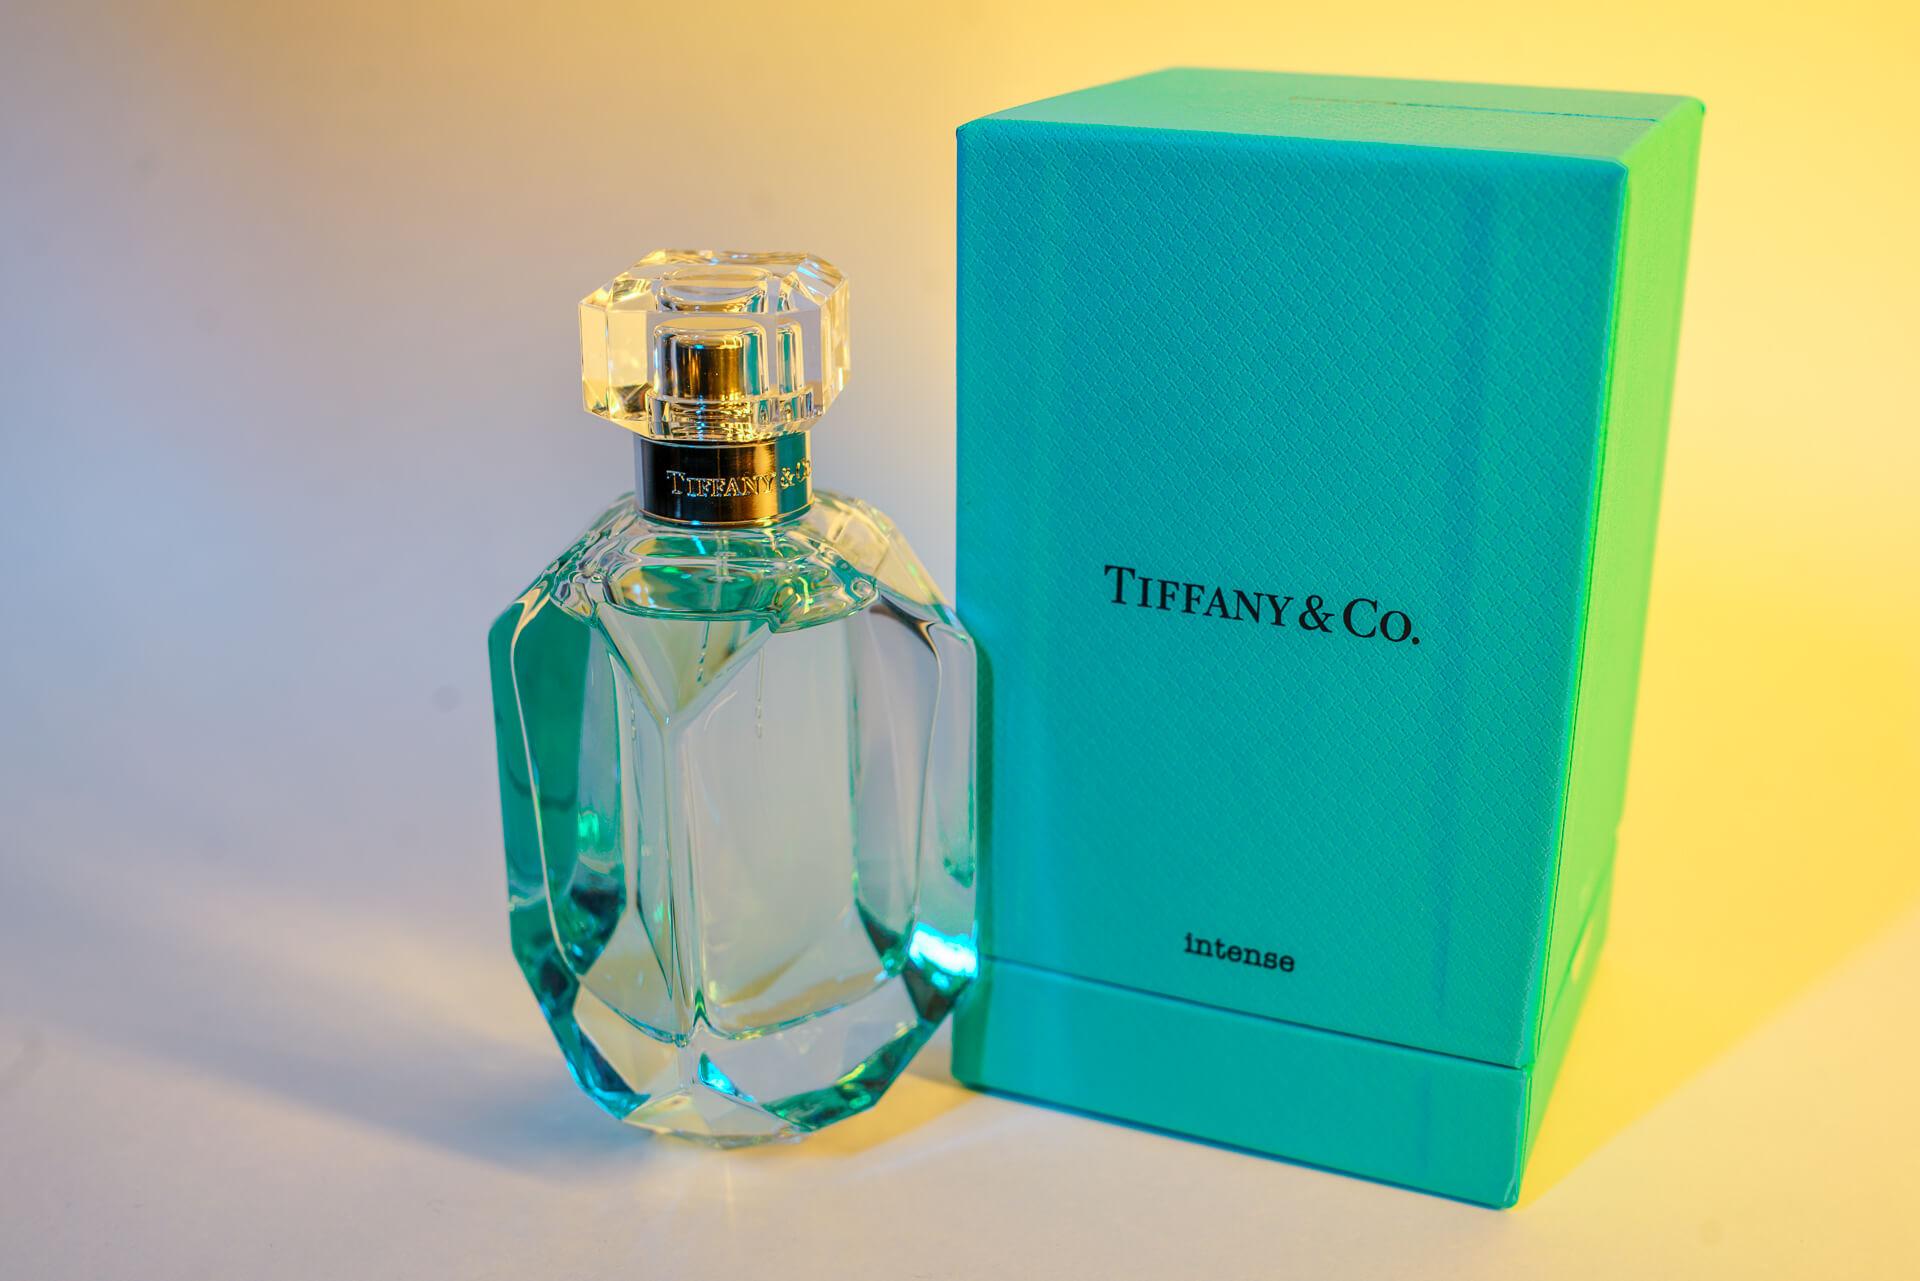 a7d96029d50 The Blue Box You Can Enjoy Every Day: Tiffany & Co. Intense Eau De Parfum